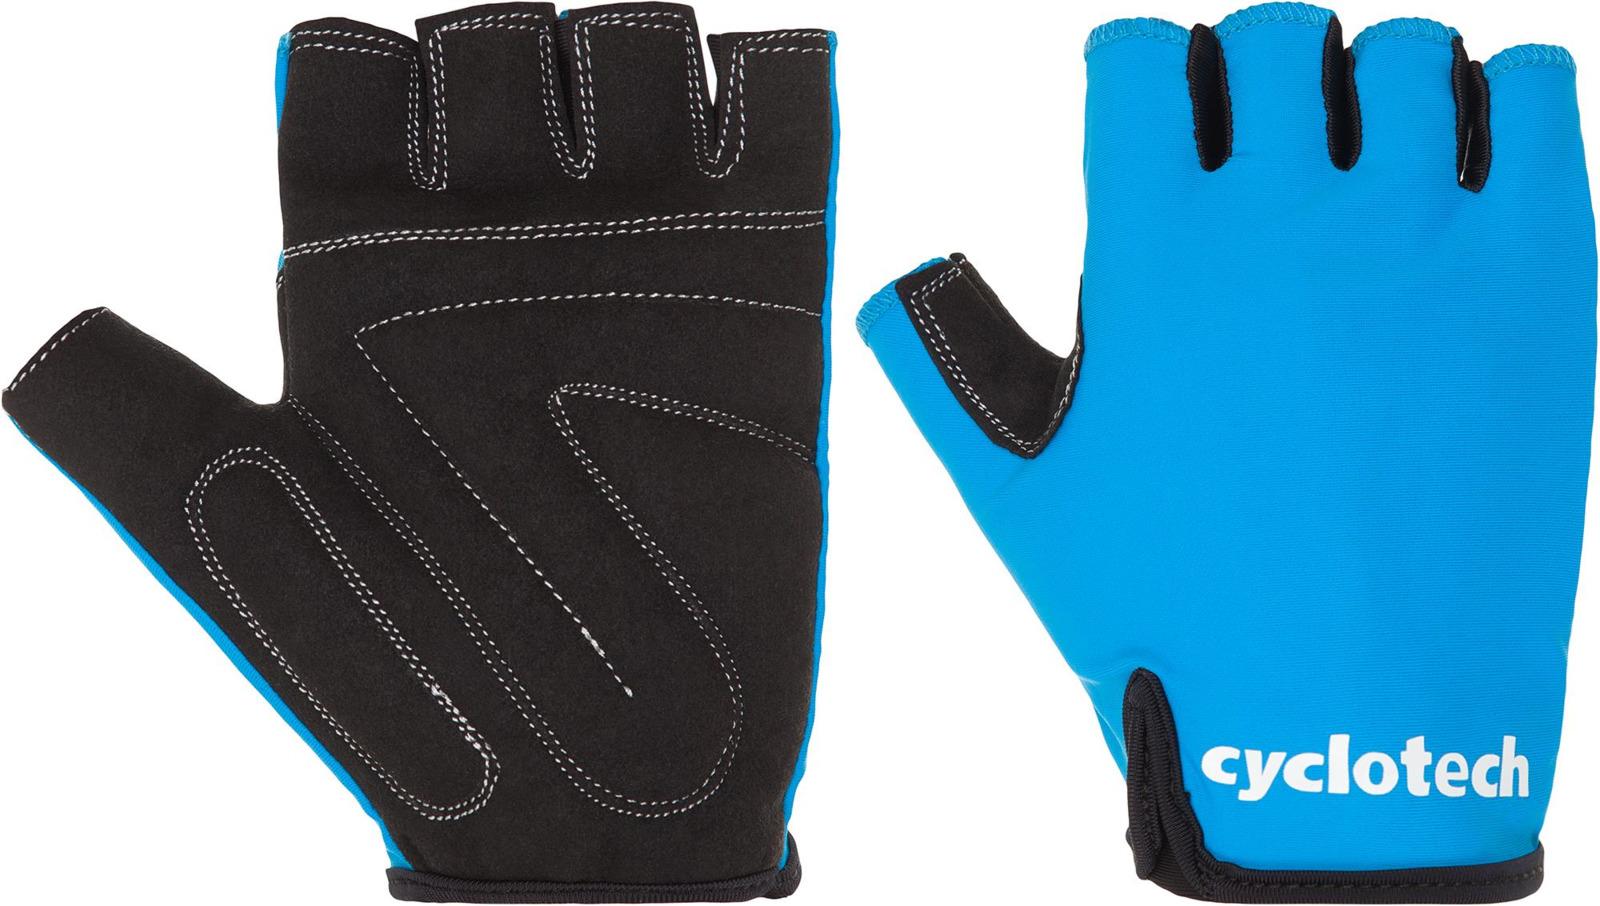 Велоперчатки Cyclotech WIND-B Bike gloves, синий, черный, размер L